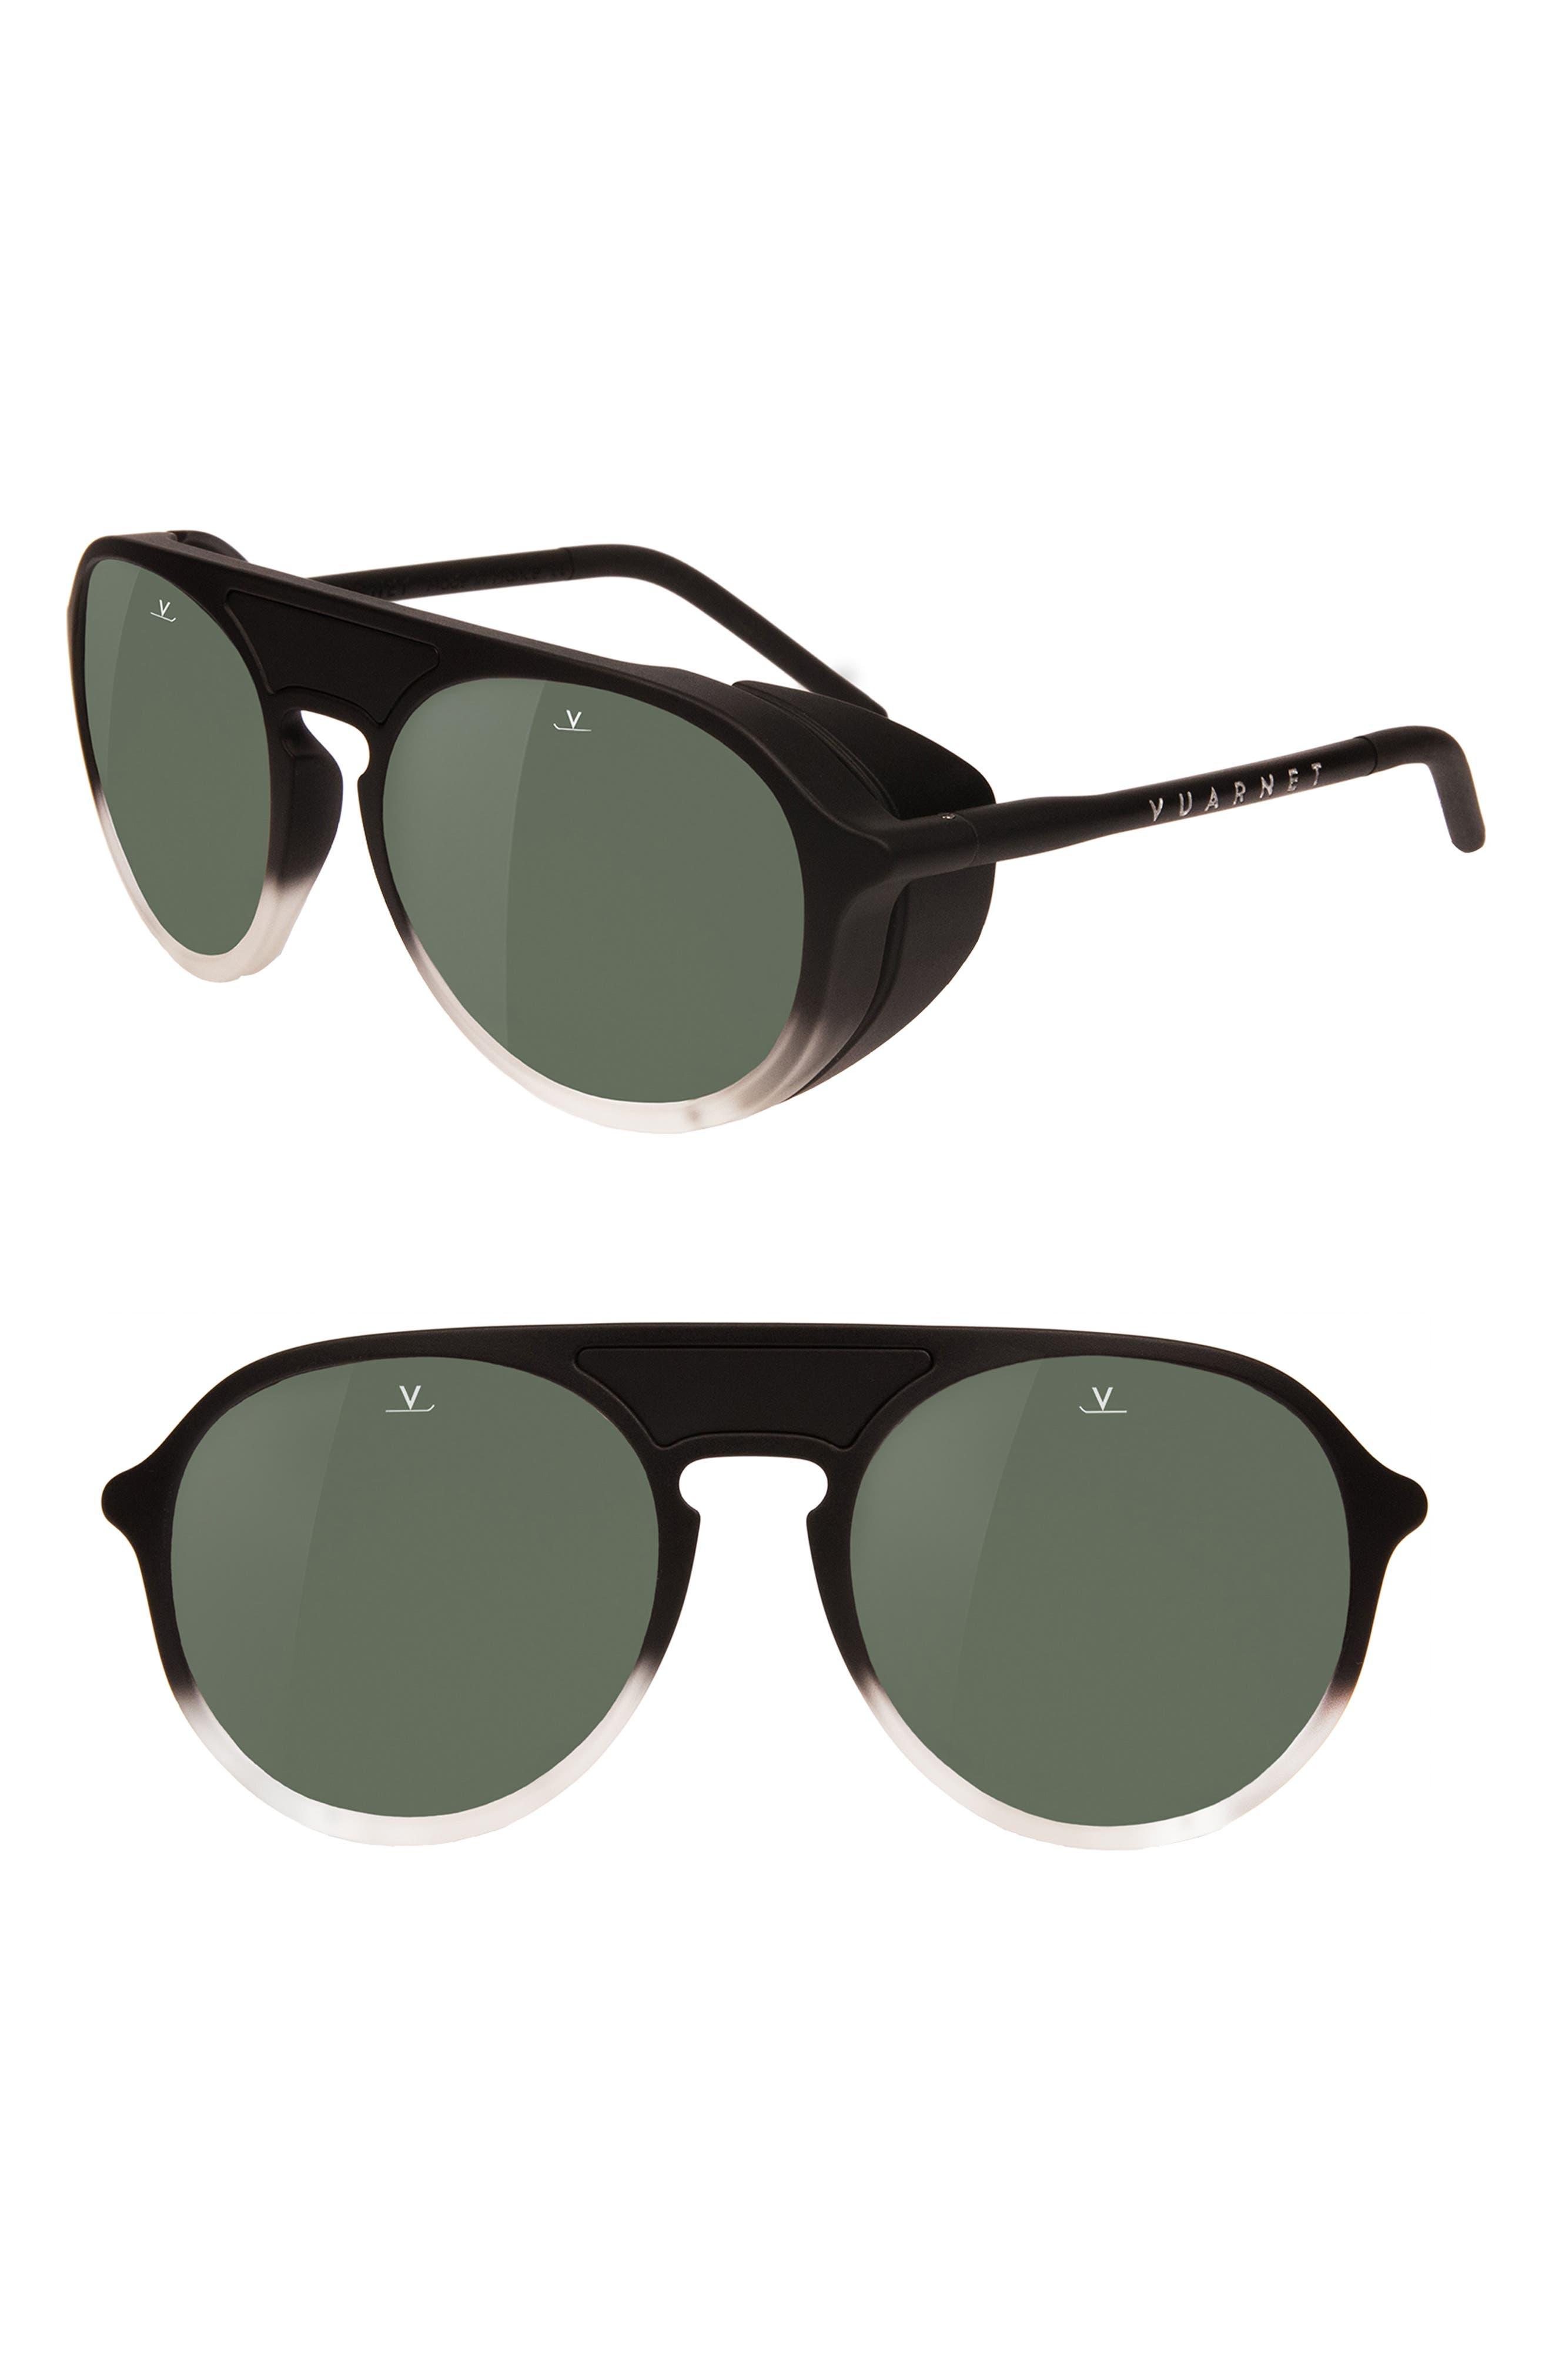 Ice 51mm Polarized Sunglasses,                             Main thumbnail 1, color,                             Gradient Black / Grey Polar